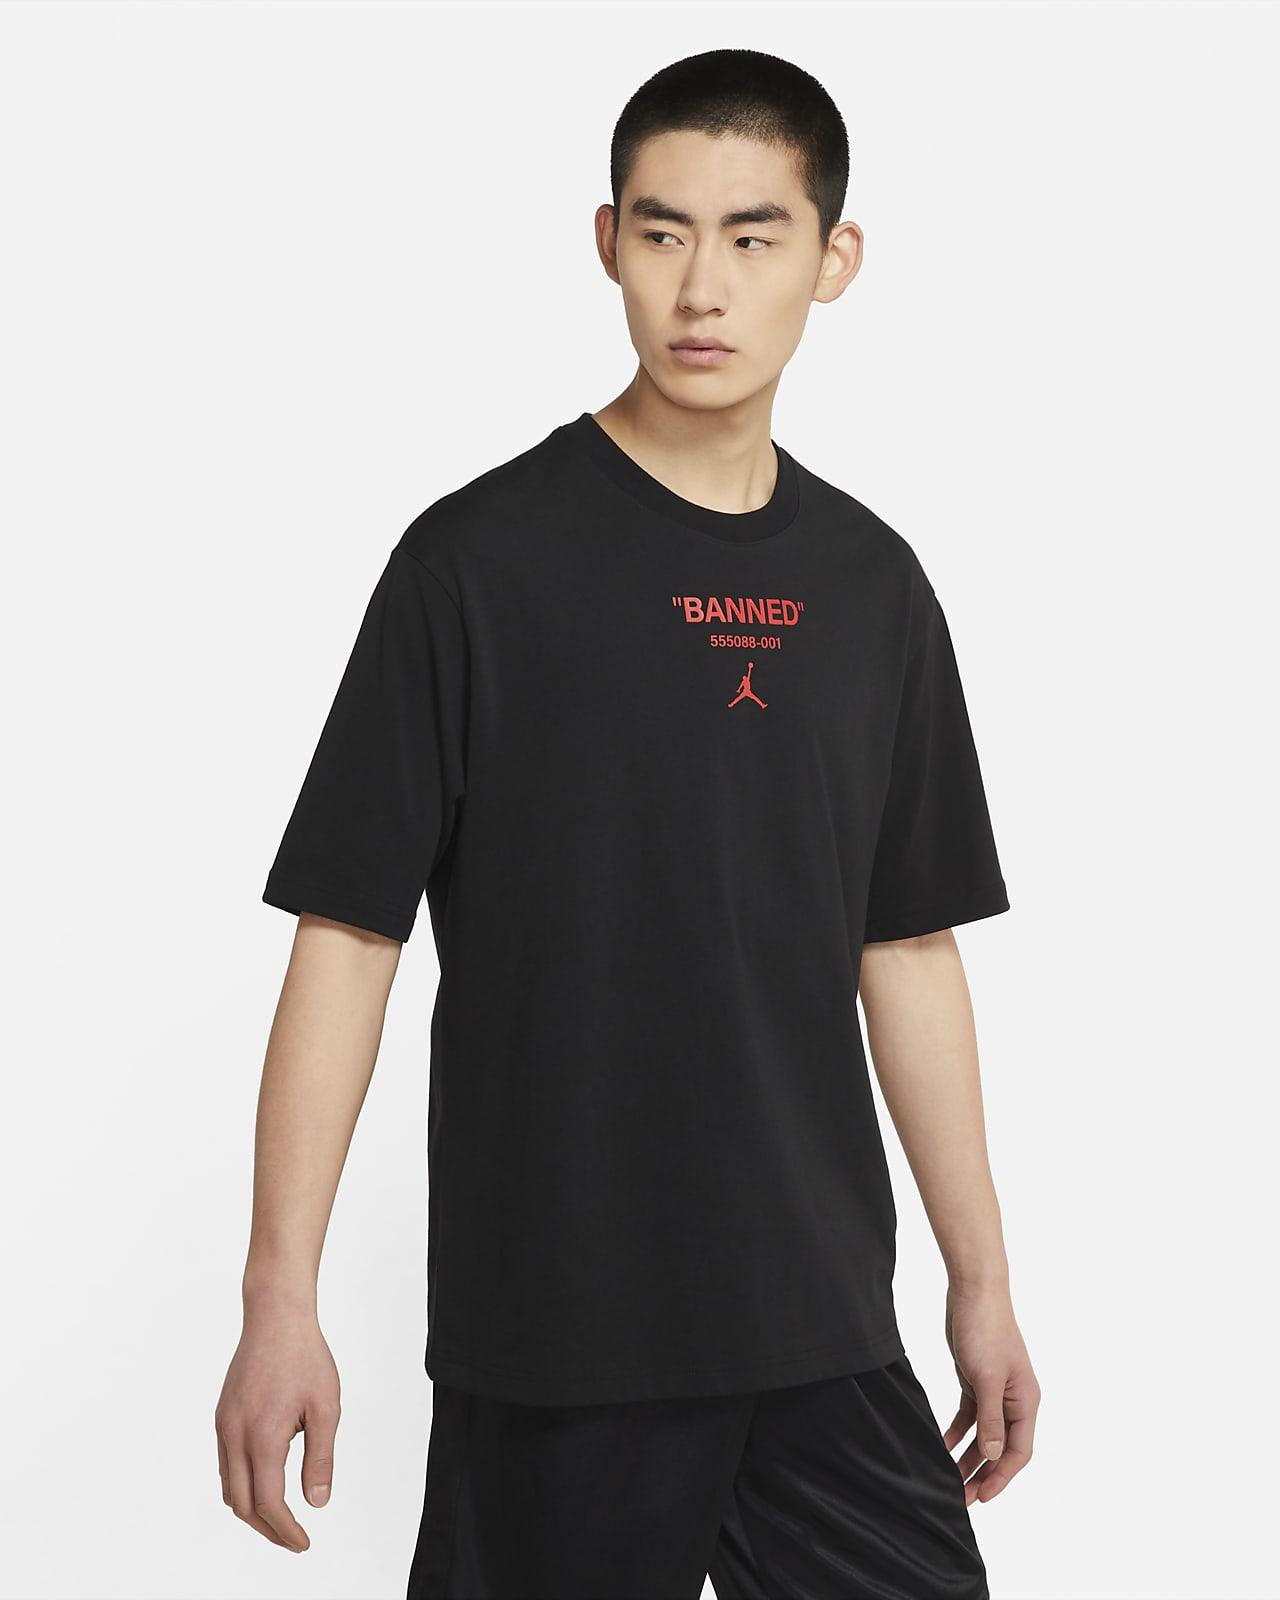 Jordan 男子短袖T恤